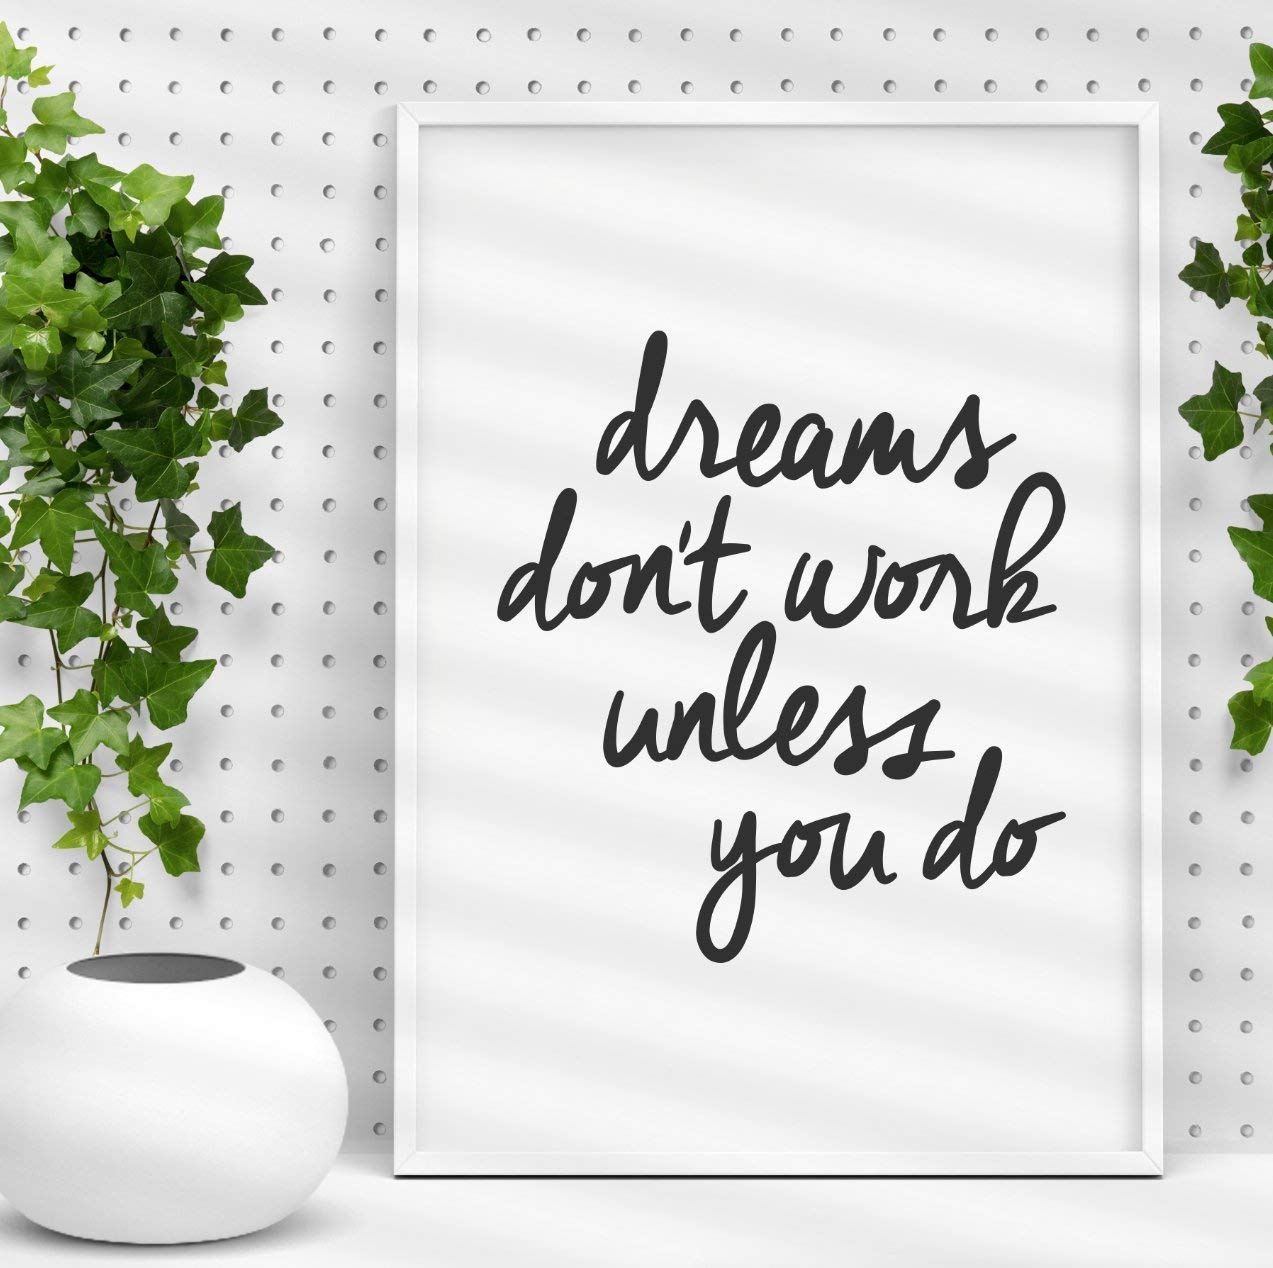 Amazon Com Dreams Don T Work Unless You Do Inspirational Print Home Decor Typography Poster Wall Art Handmade